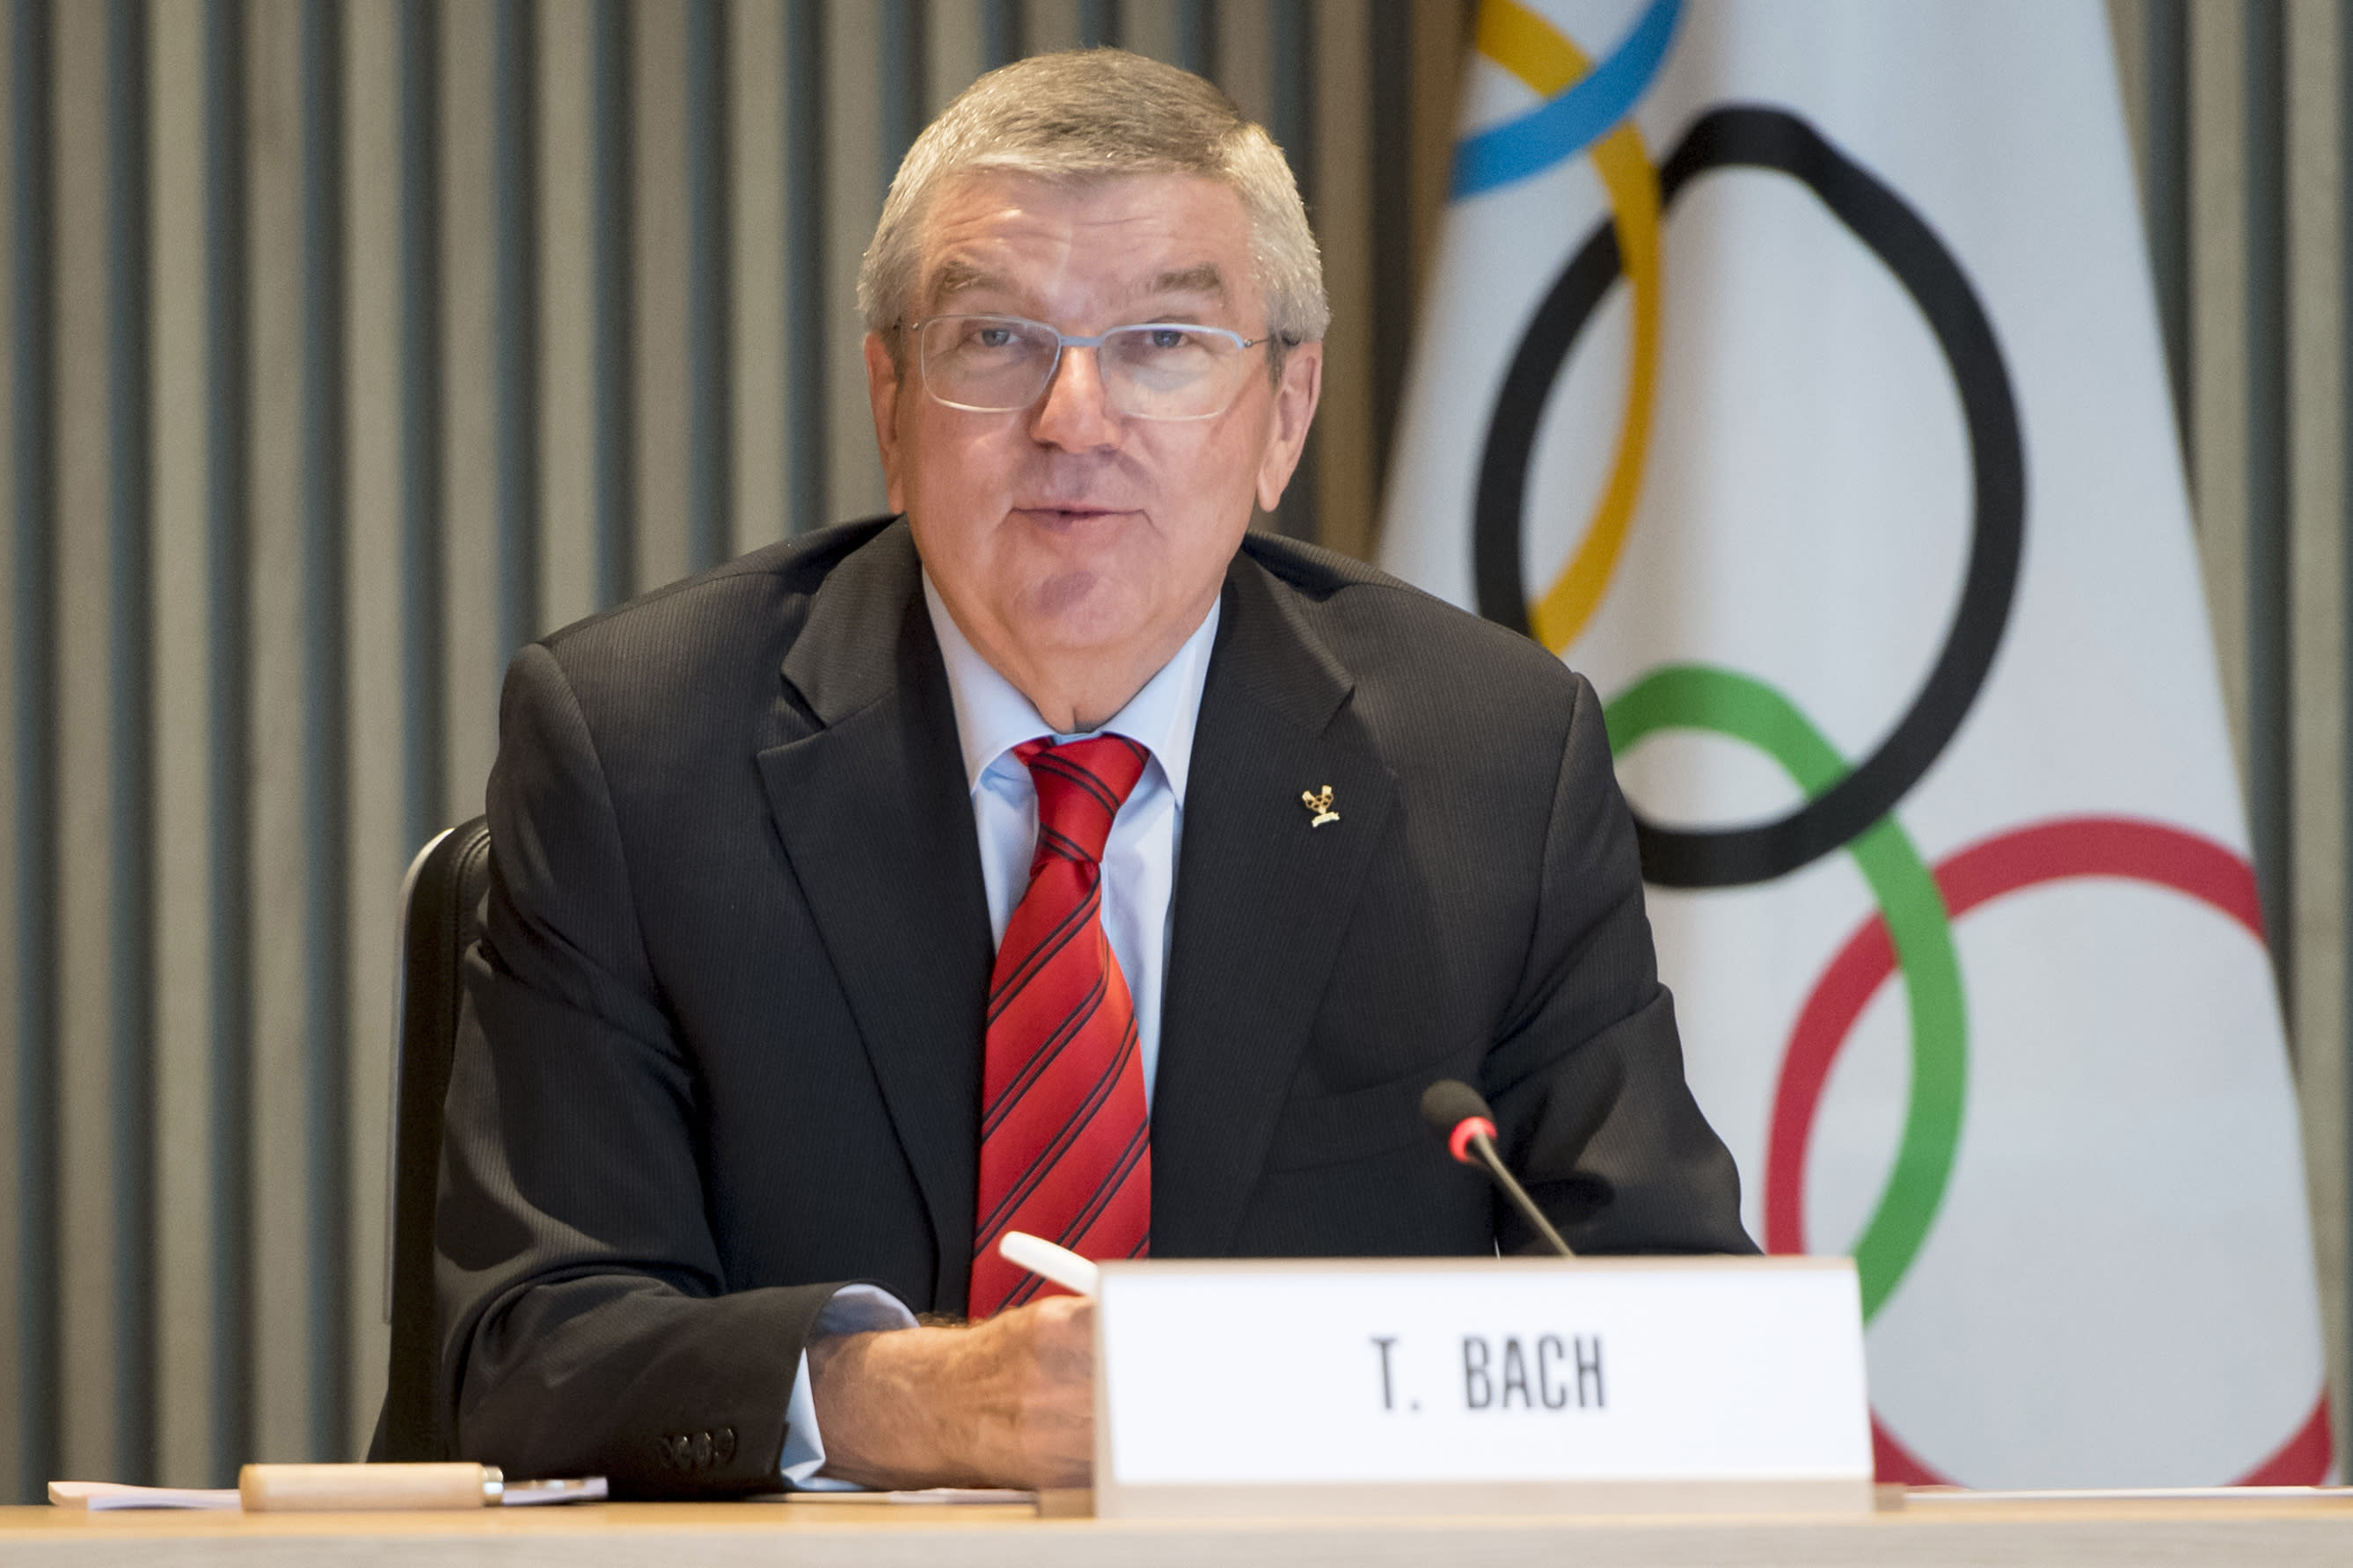 Paris mayor disturbed by new Olympic sponsor Airbnb